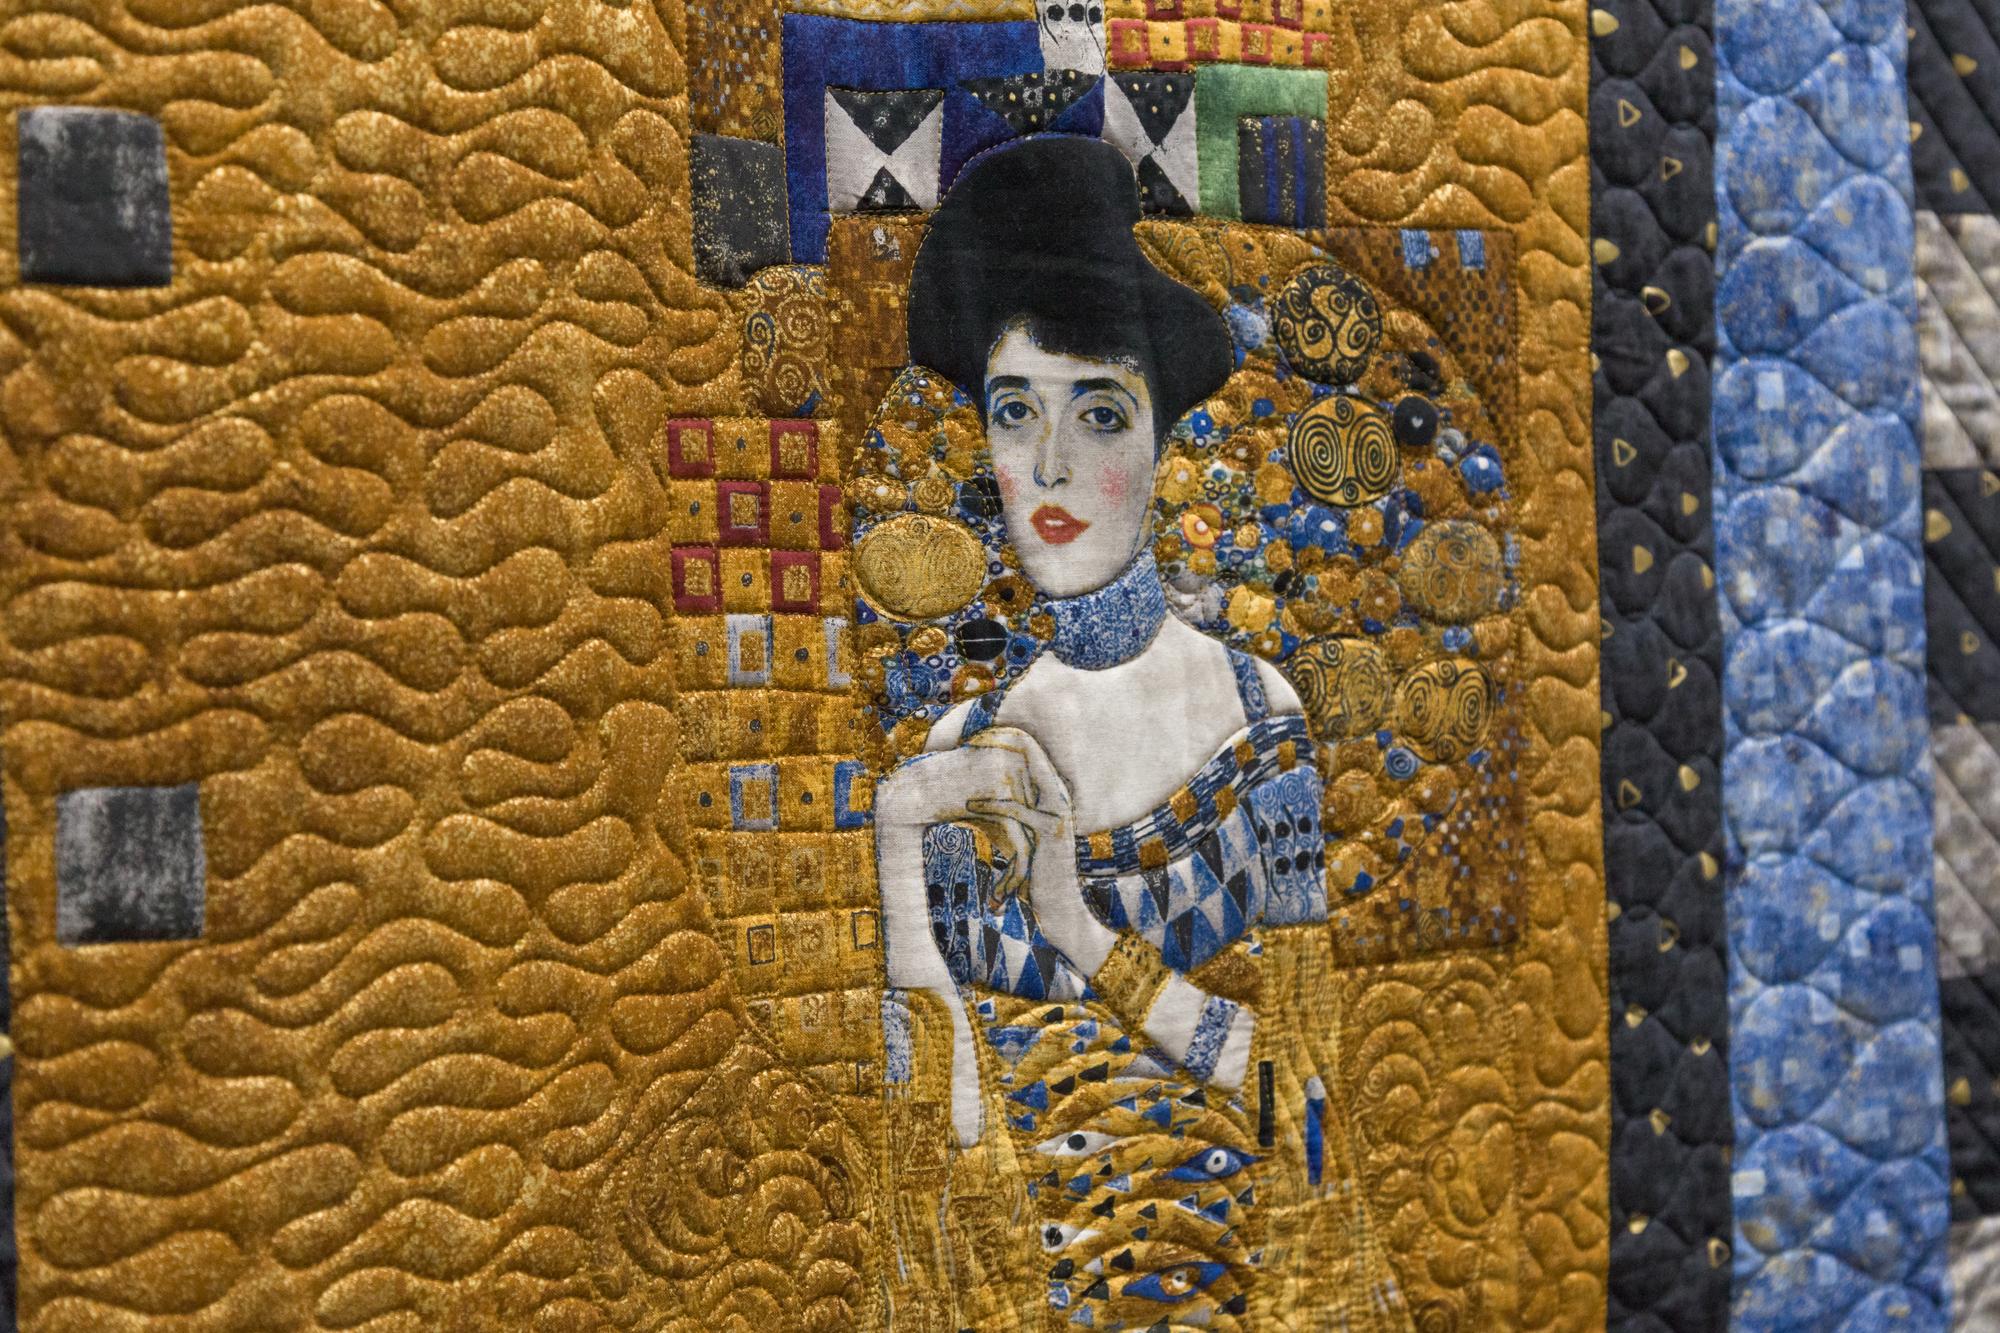 RK_QMfall17_Gustav Klimt 09.jpg